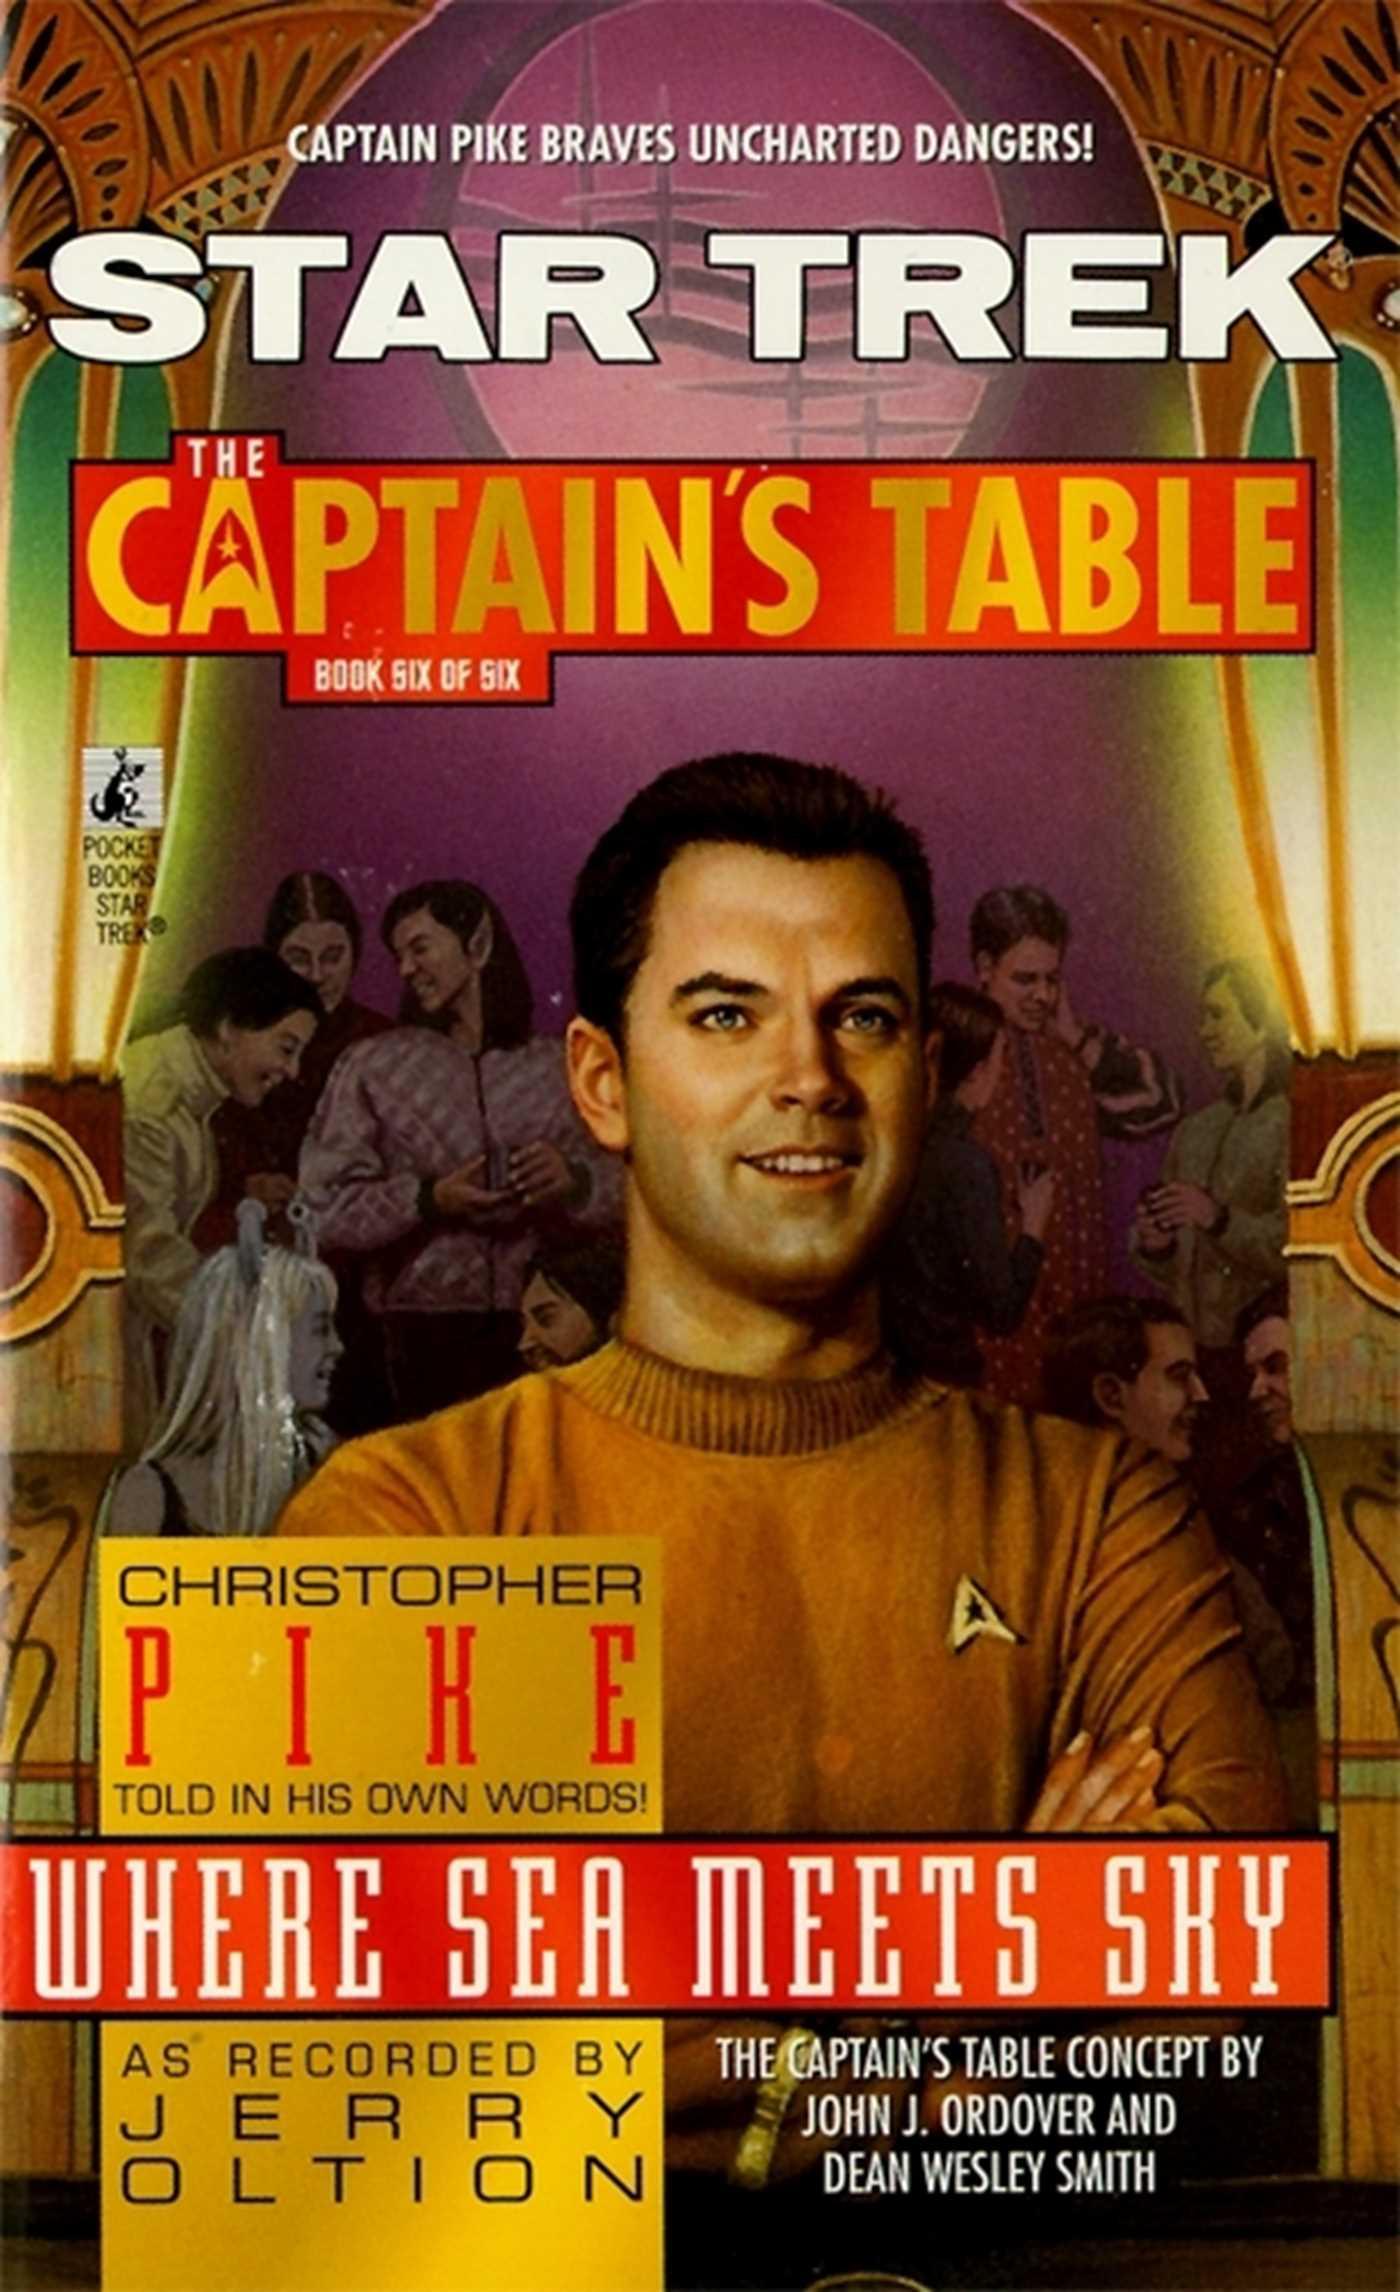 Star trek the captains table 6 christopher pike where sea meets sky 9781439108536 hr